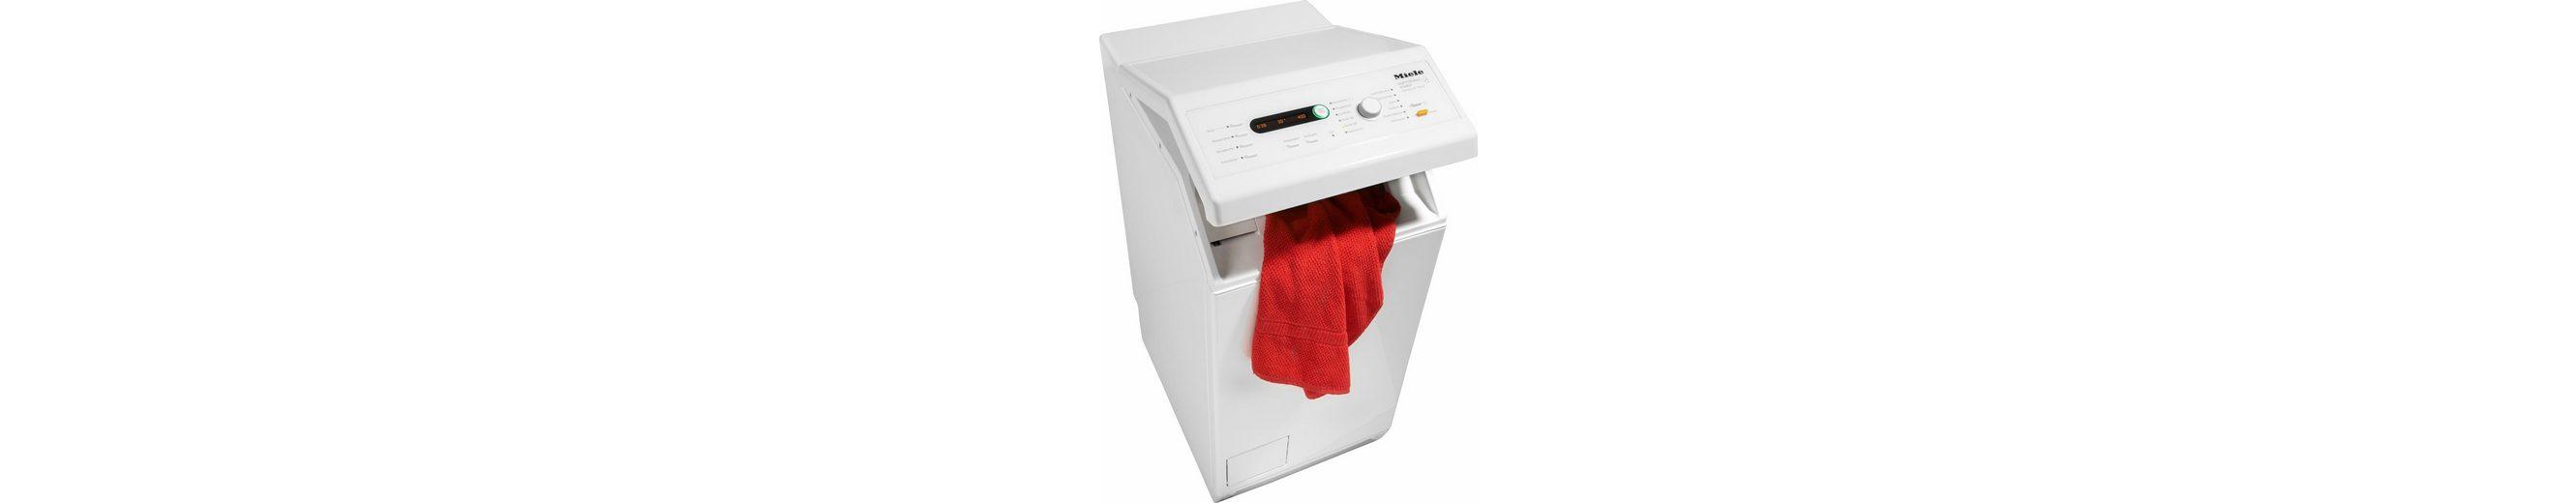 MIELE Waschmaschine Toplader W 690 F WPM, A+++, 6 kg, 1300 U/Min